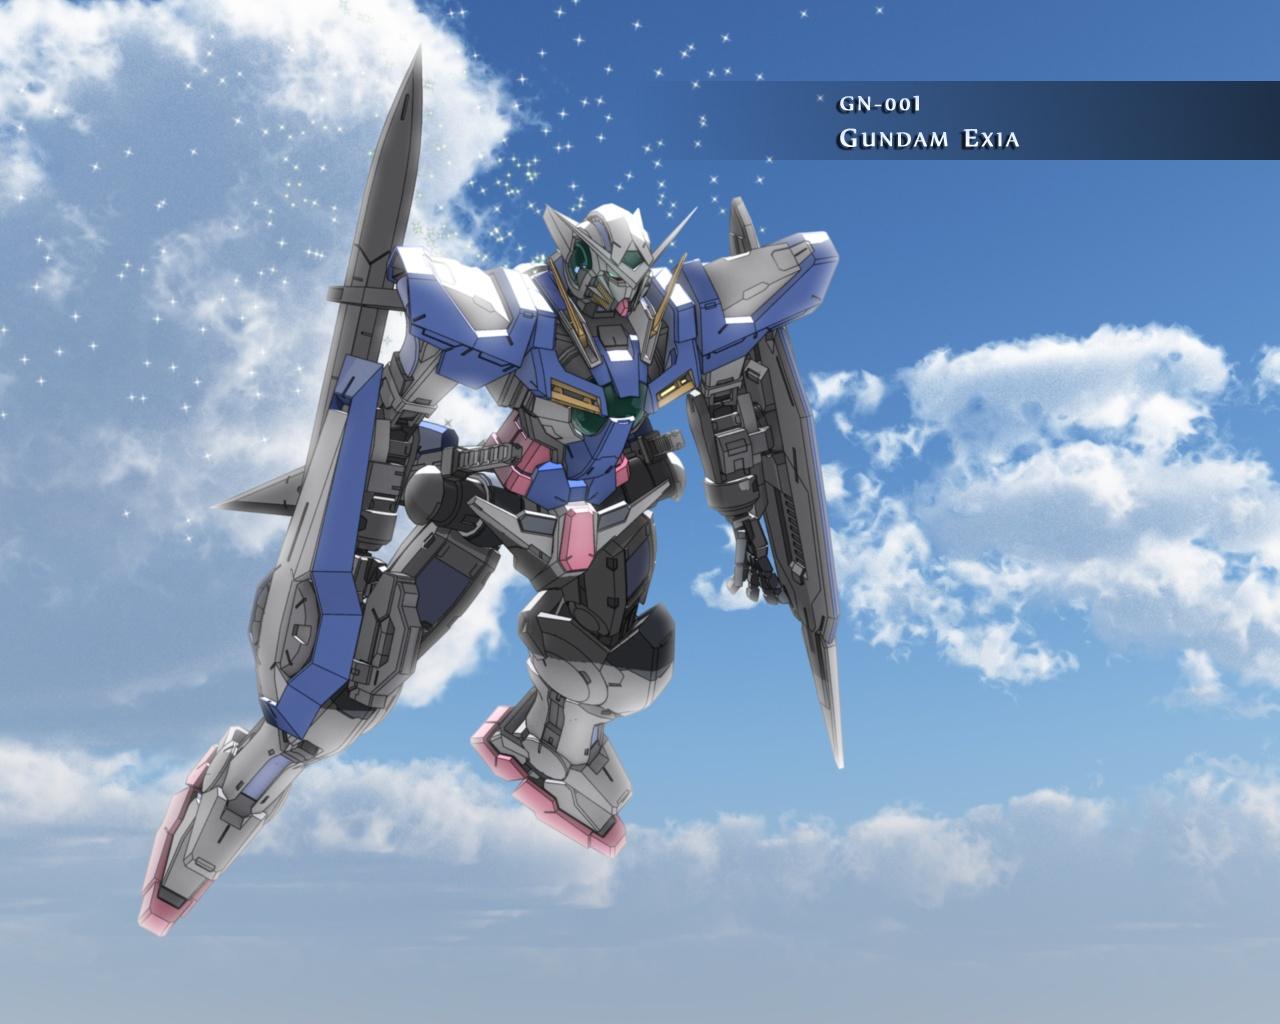 Image   GN 001 Gundam Exia Sky Wallpaperjpg   Gundam Wiki 1280x1024